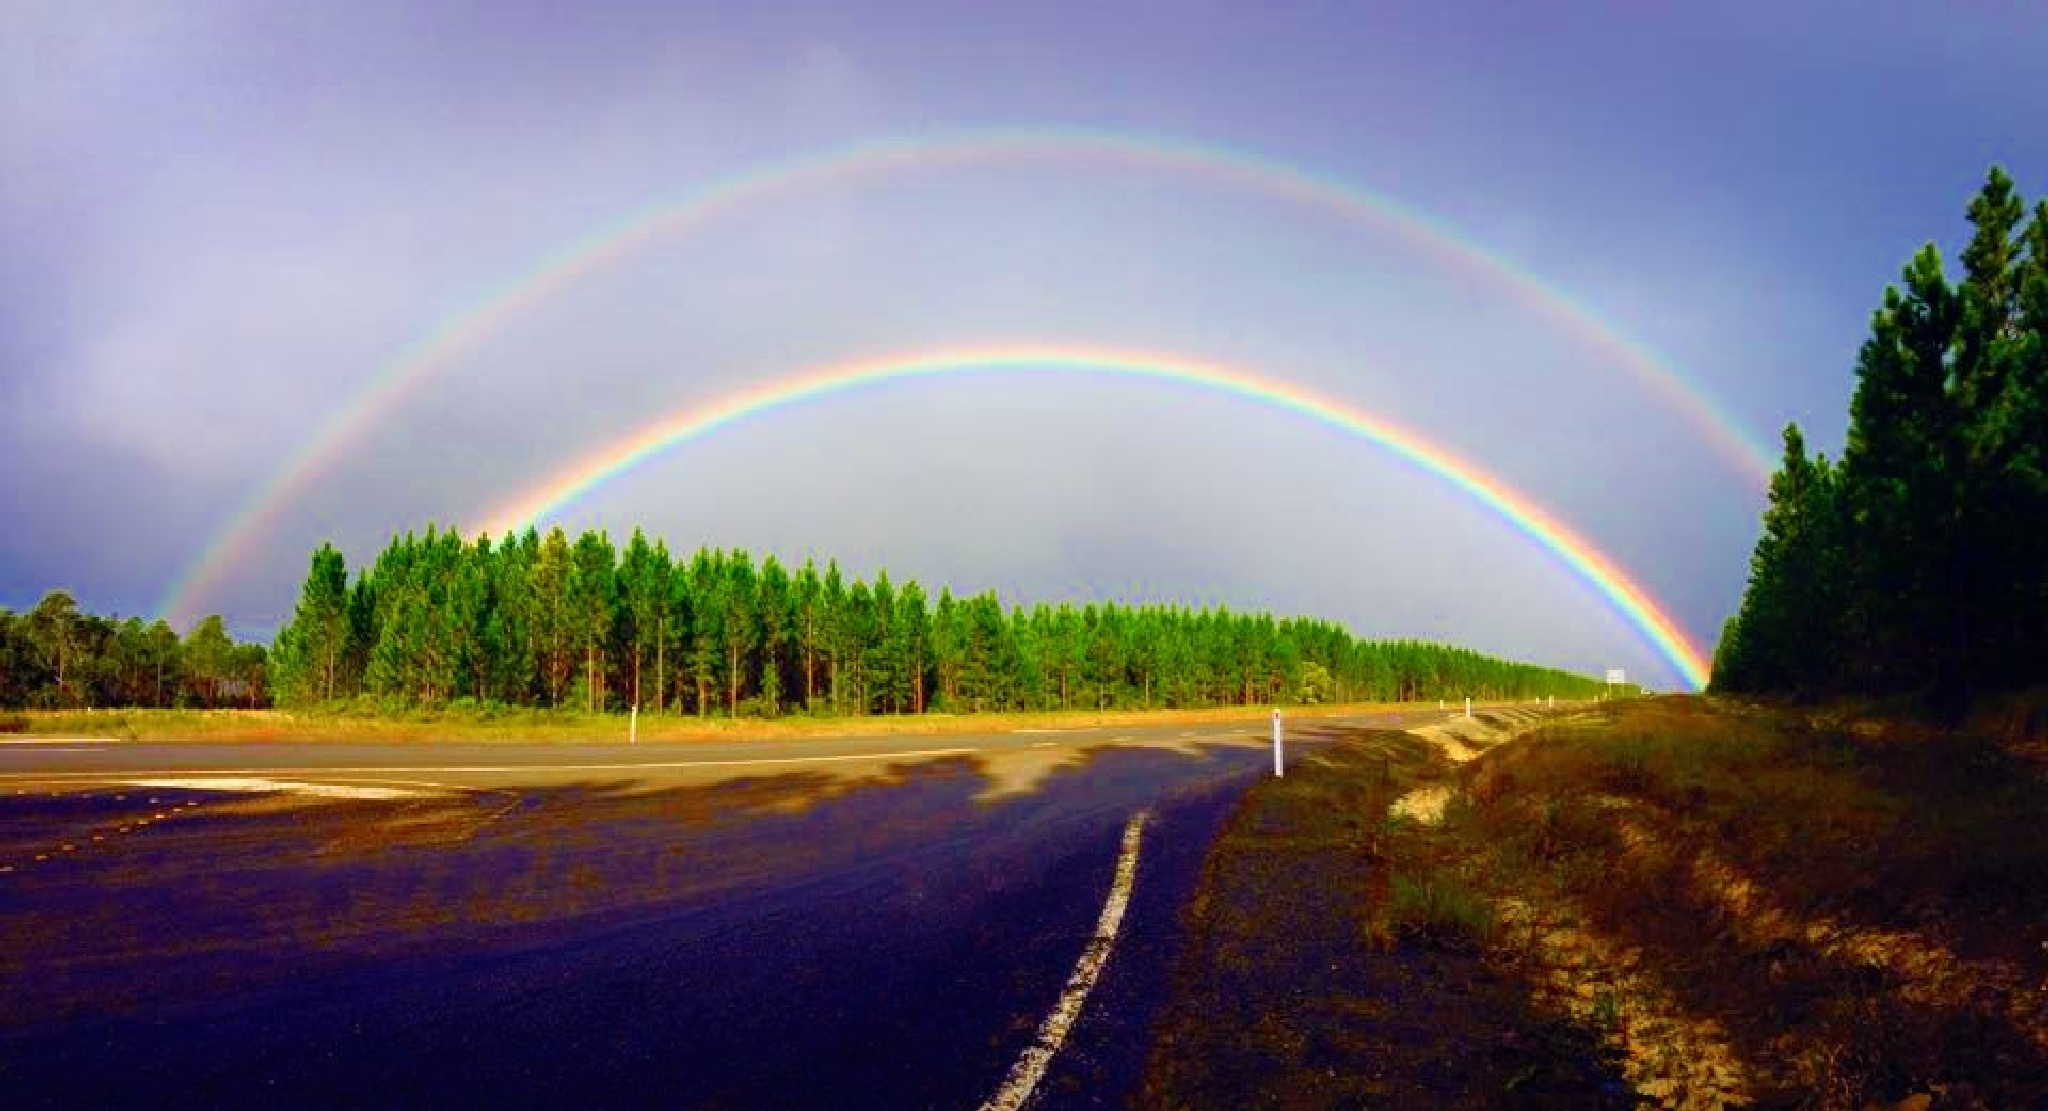 Double Rainbow by Jessa Diza